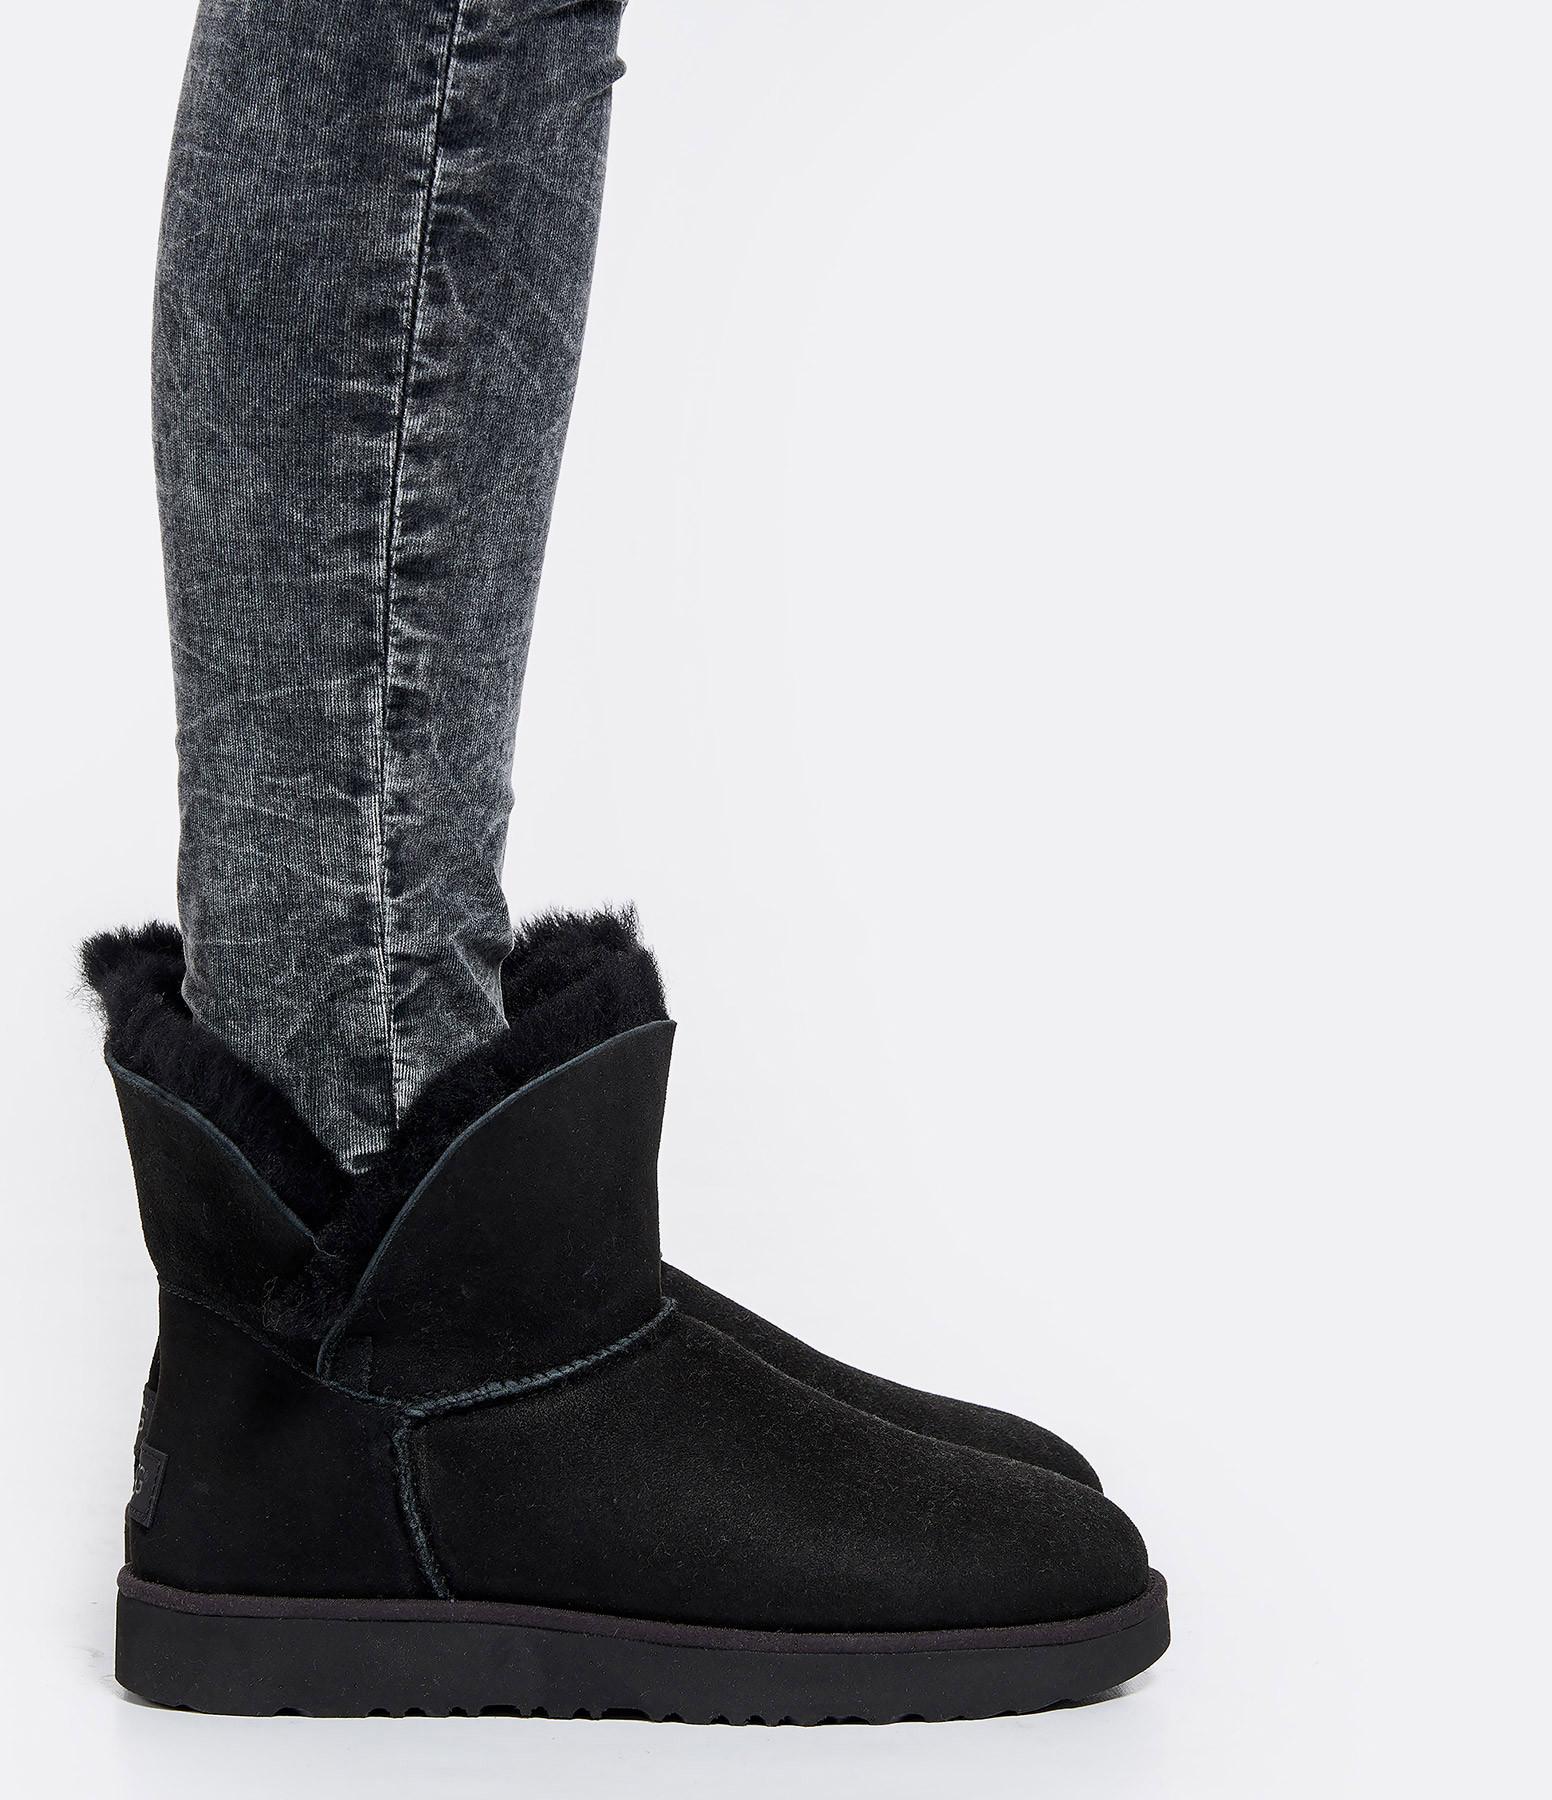 UGG - Boots Classic Cuff Mini Noir